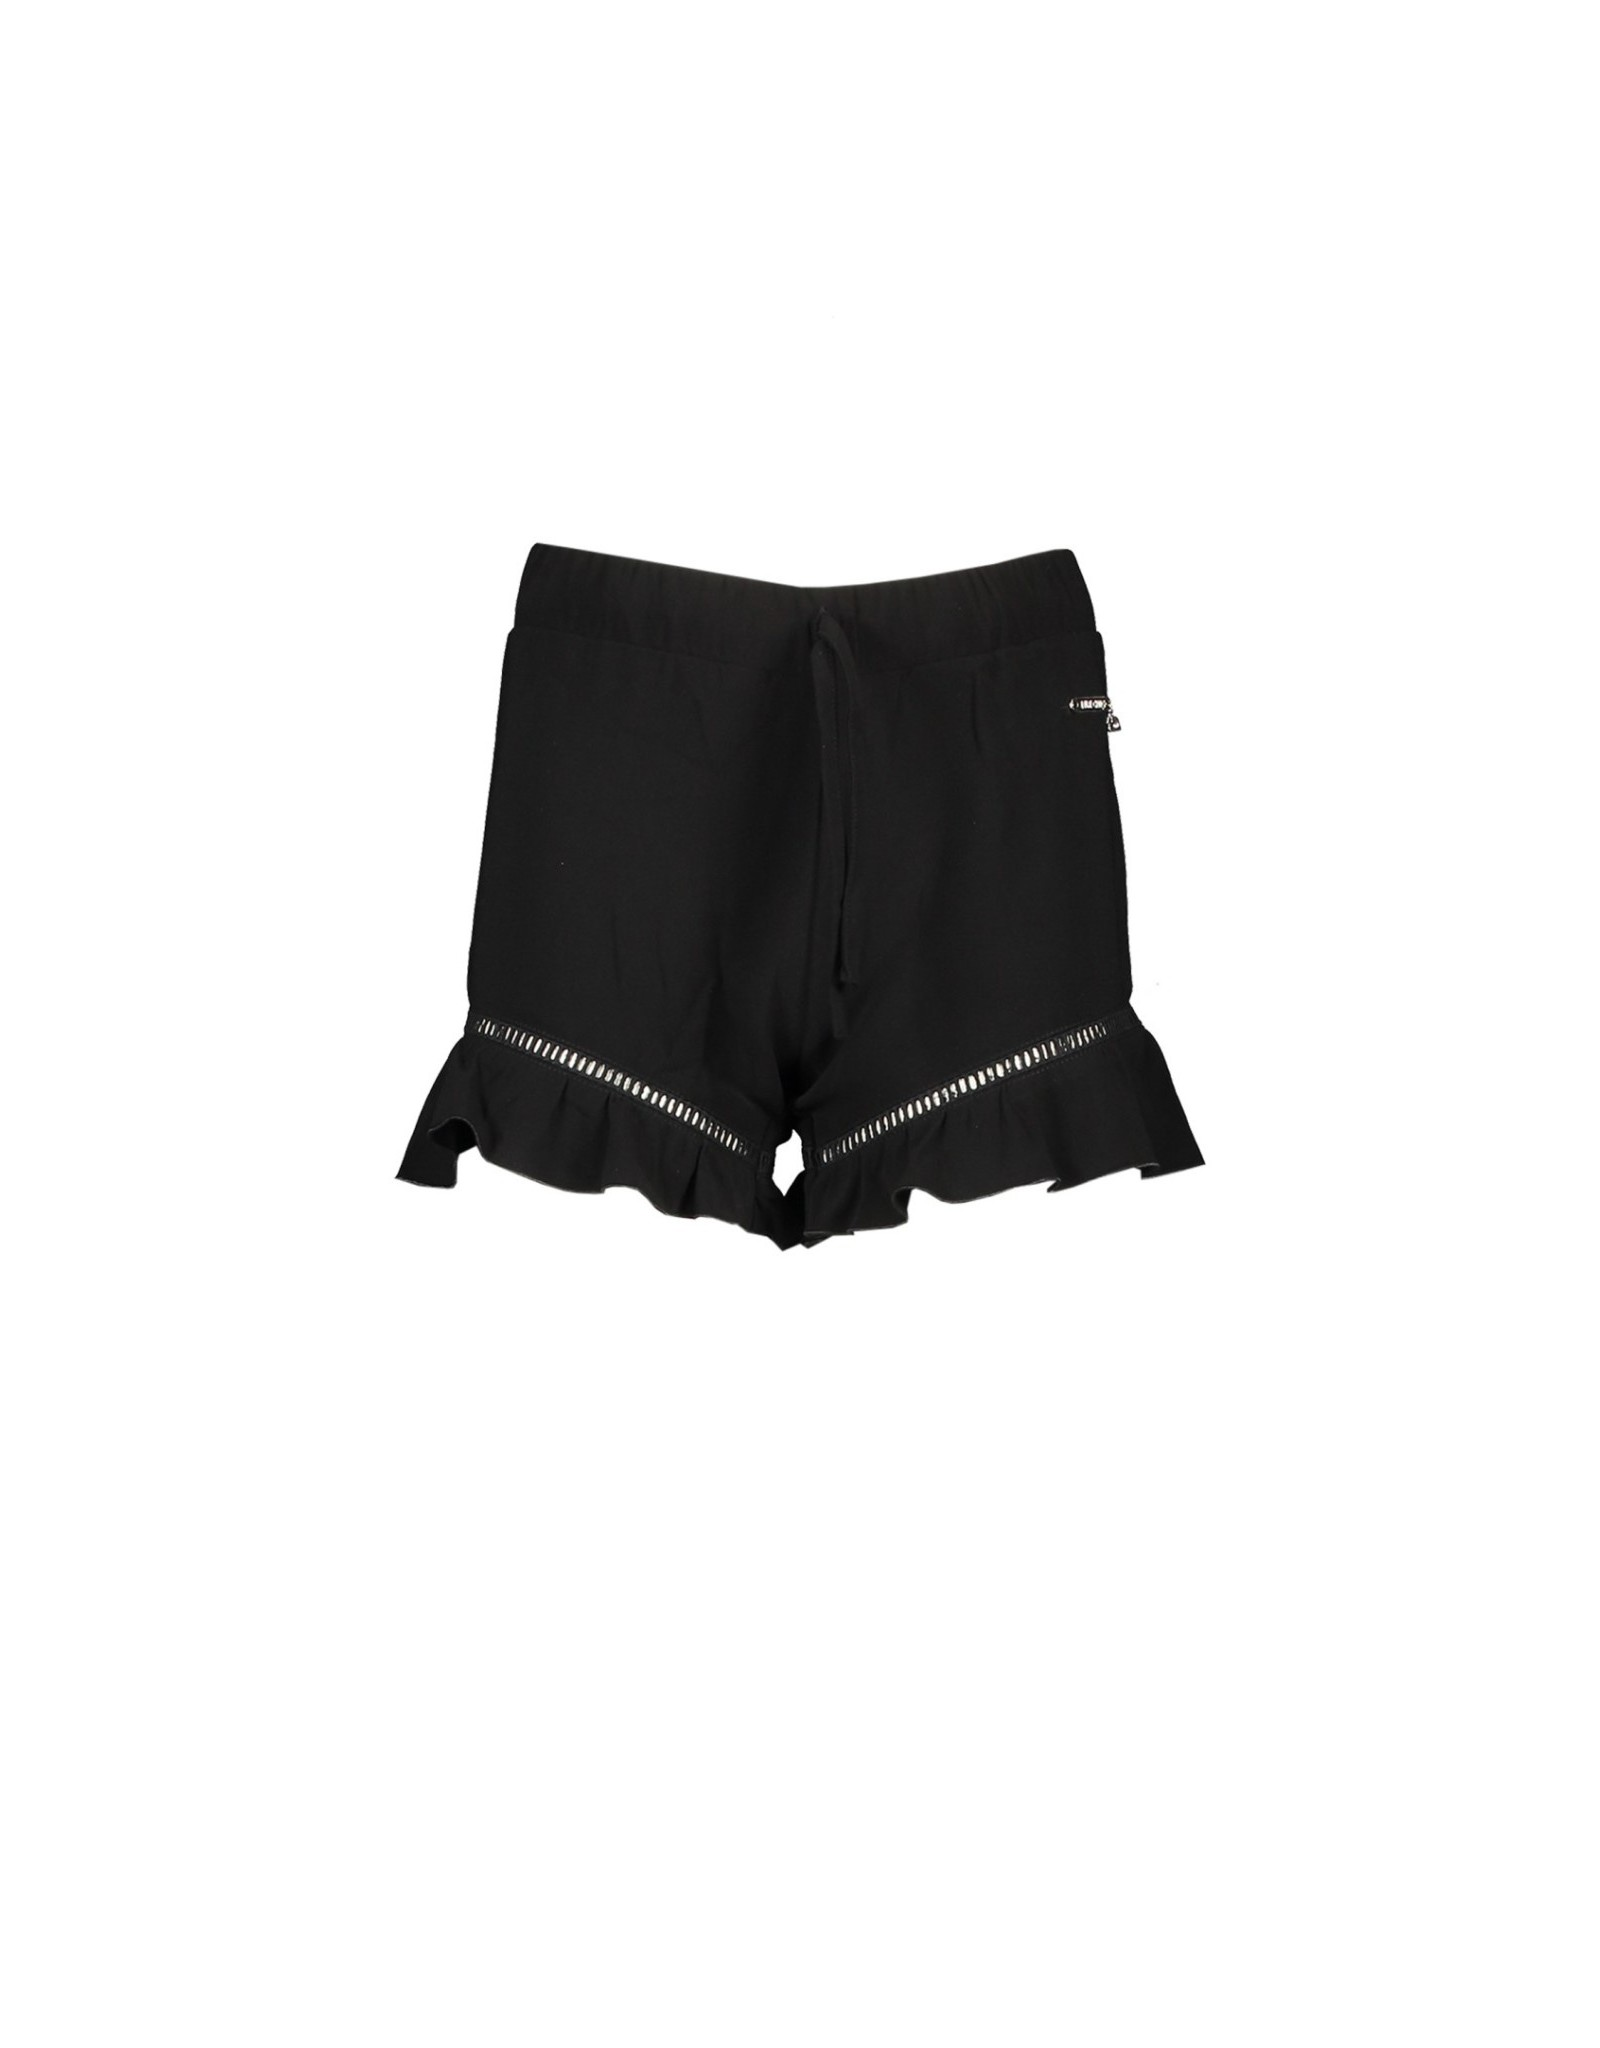 Elle Chic Elle Chic meiden korte broek Black Chic Stretch Crepe